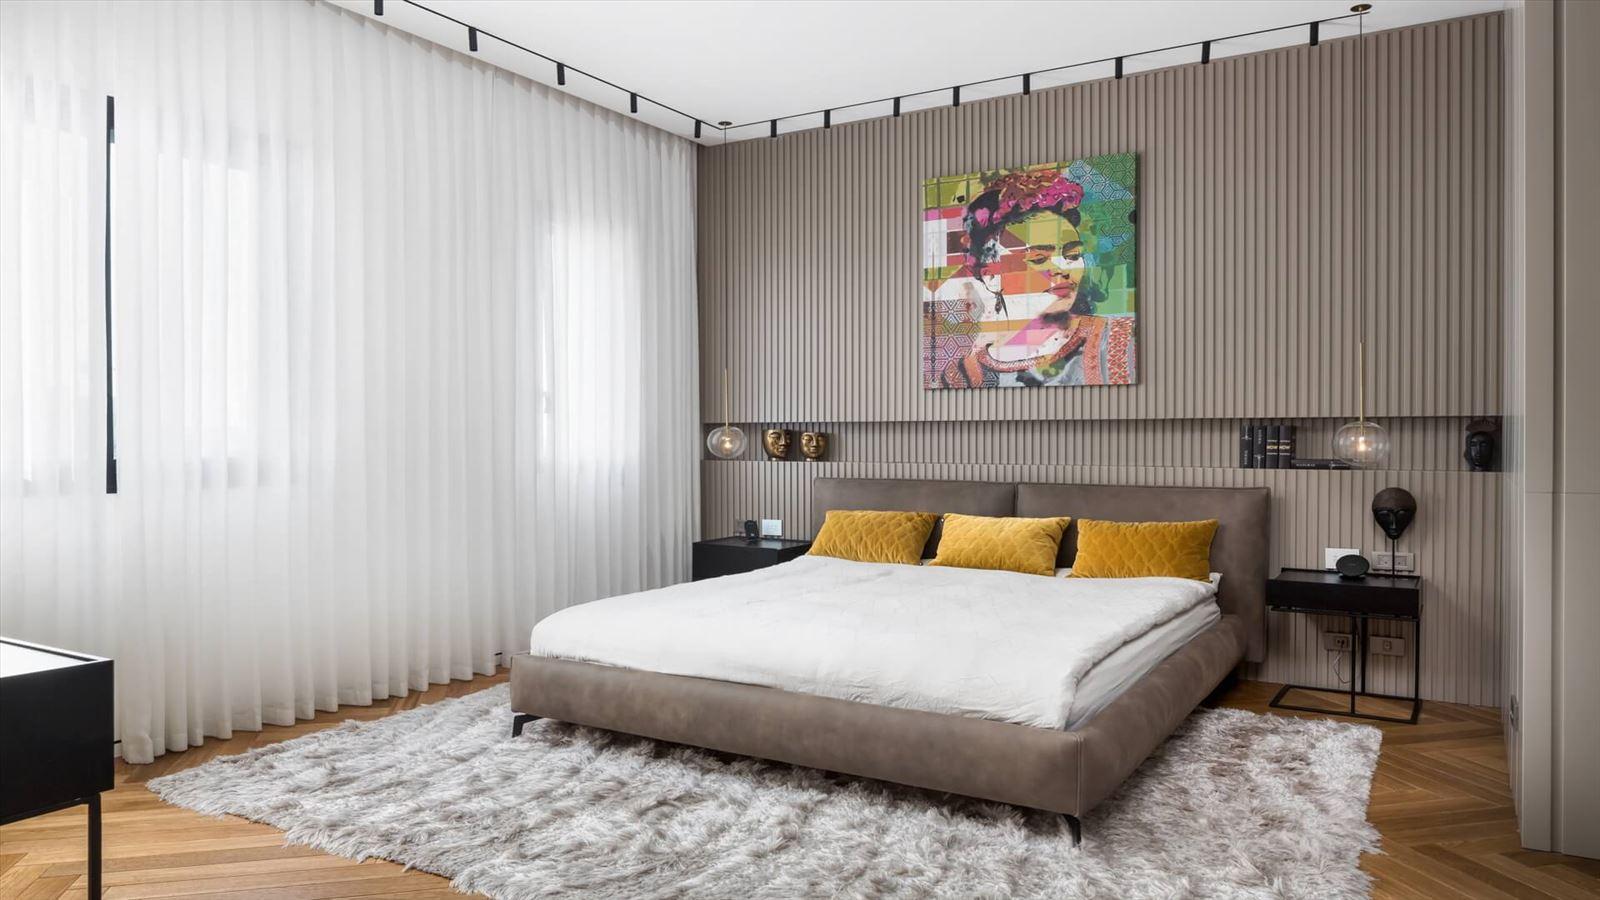 Penthouse Carmelit - עיצוב תאורה בחדר השינה על ידי קמחי דורי